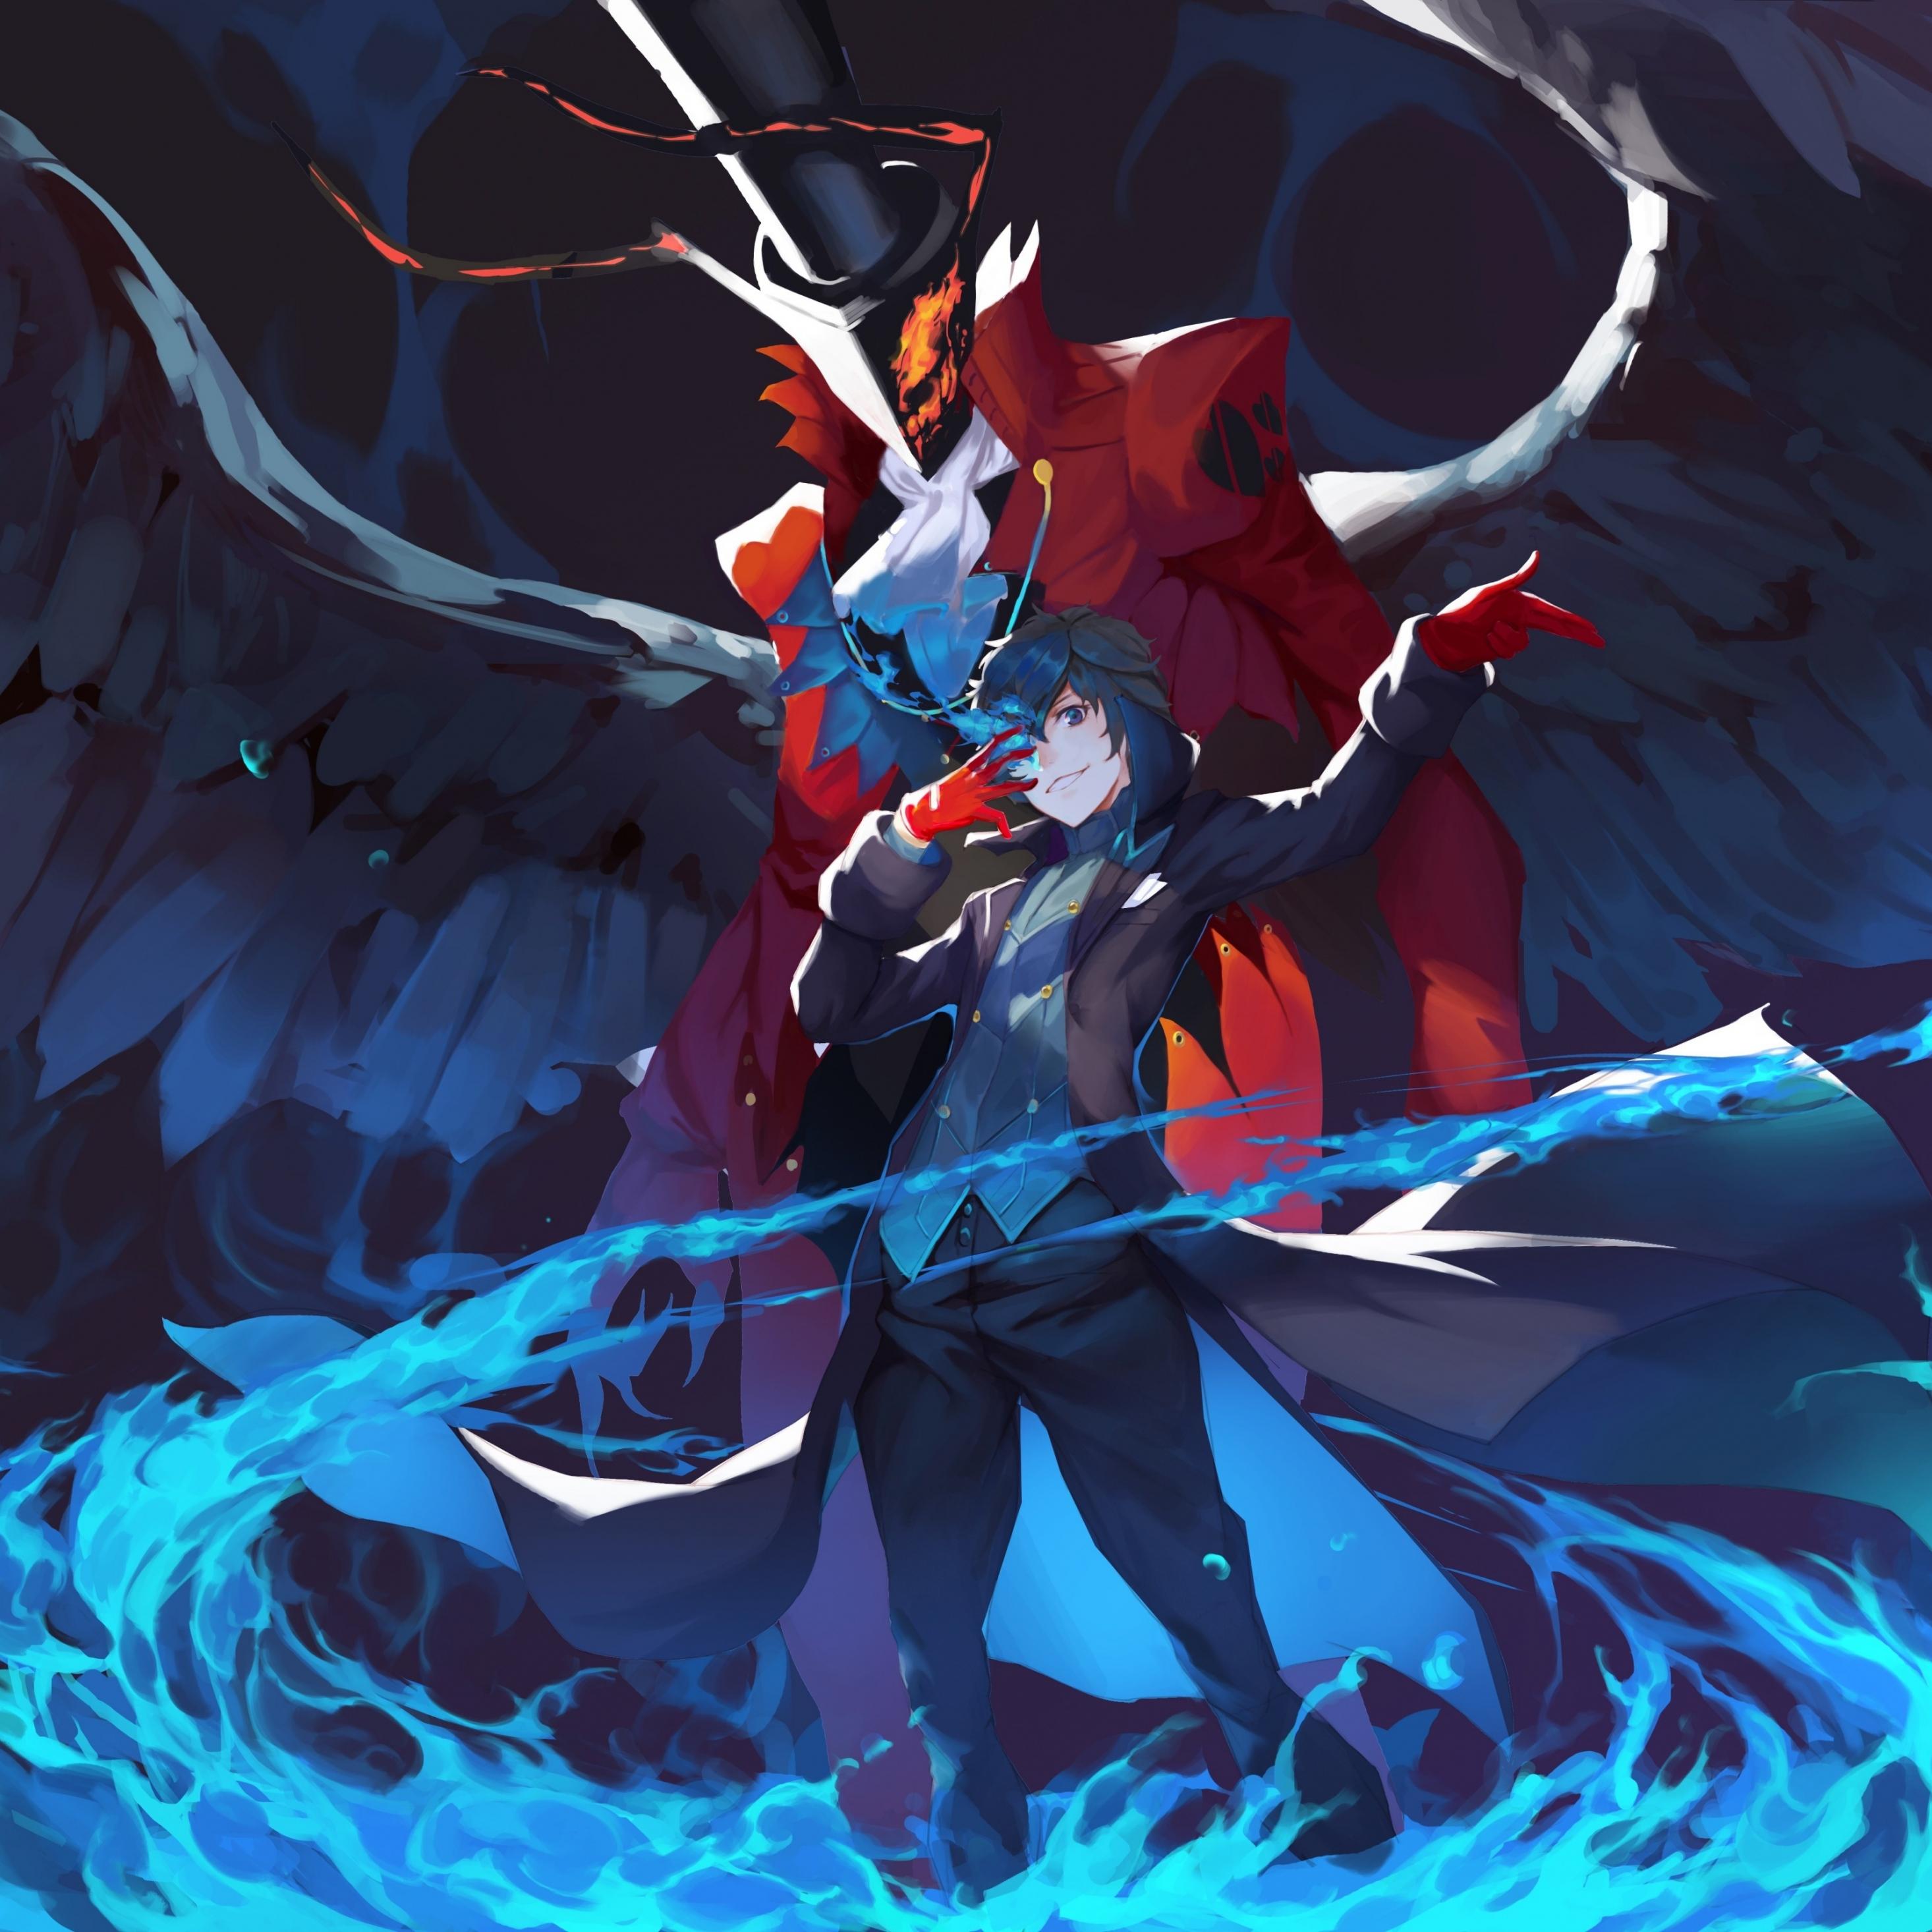 Download 2932x2932 Wallpaper Akira Kurusu Persona 5 Anime Video